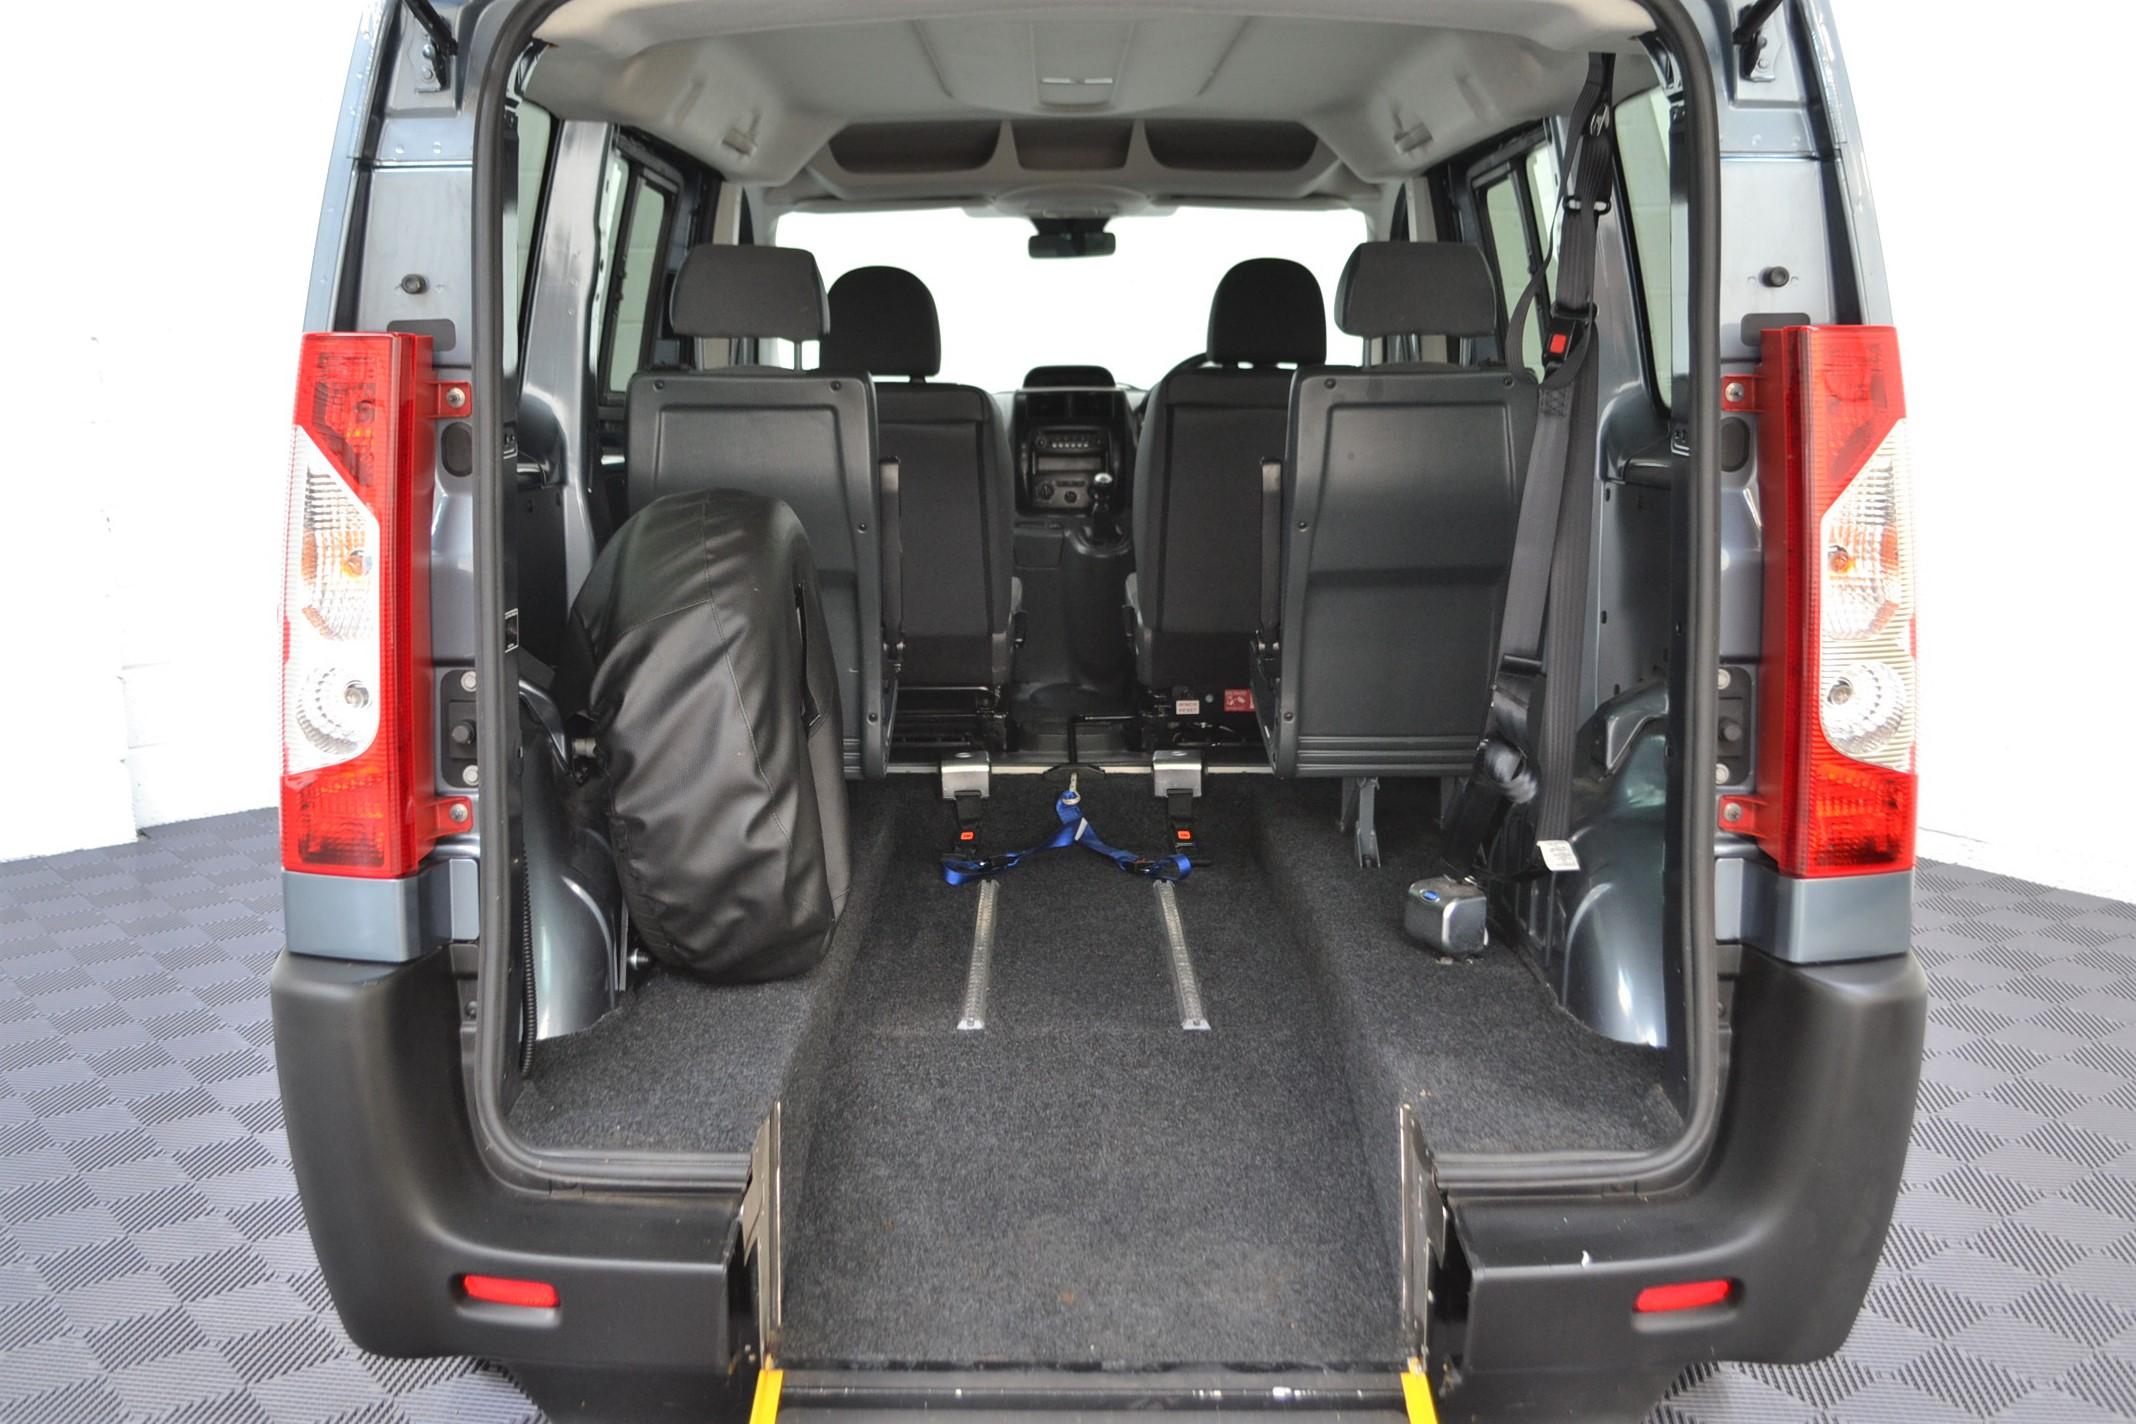 WAV Cars For Sale Bristol Wheelchair Accessible Vehicles Used For Sale Somerset Devon Dorset Bath Peugeot Expert YJ65 JDU 8